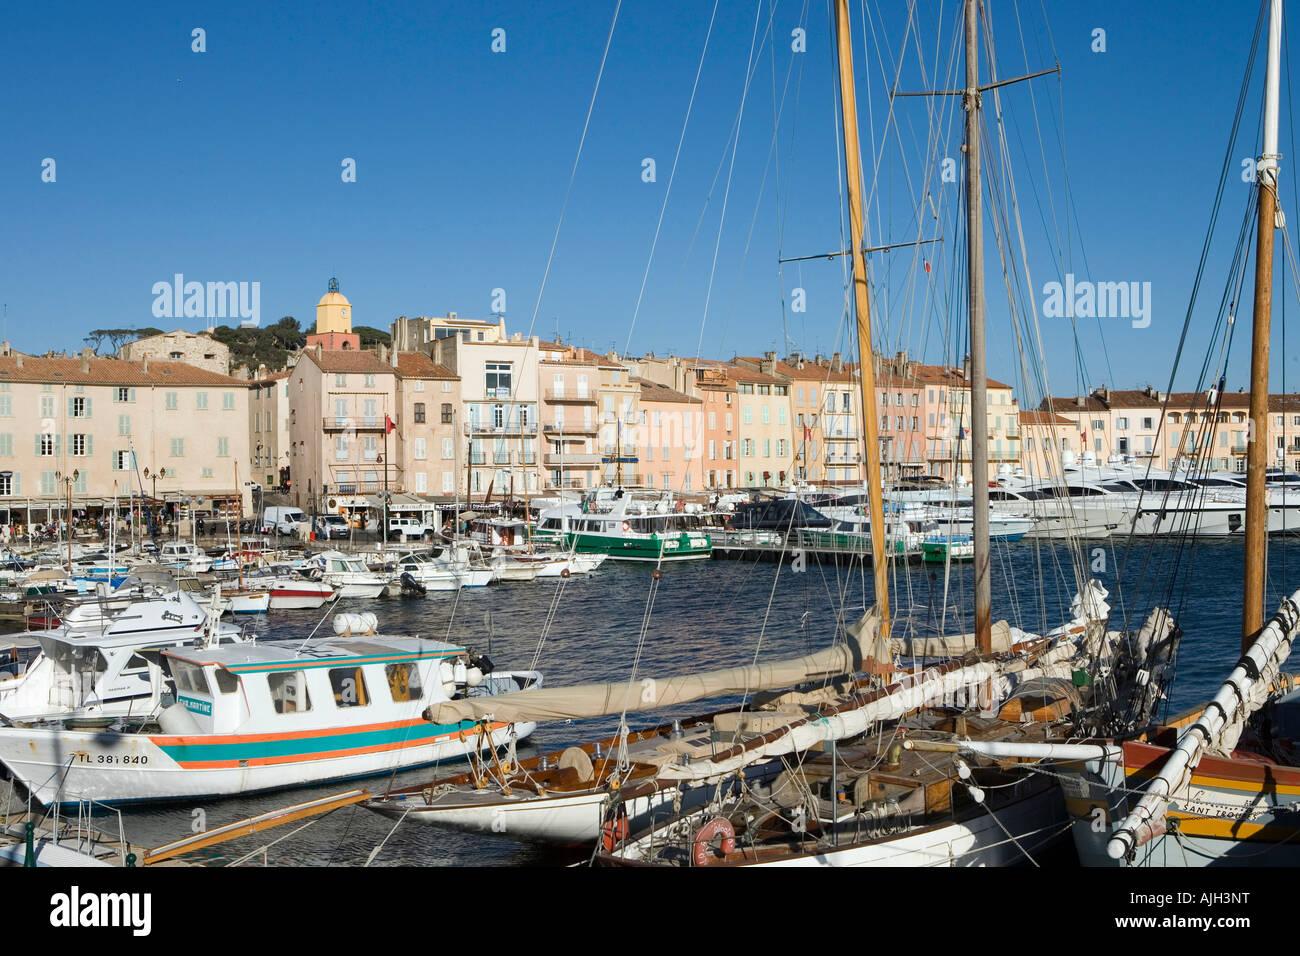 Saint Tropez Port Basin And Promenade Stock Photo 14737331 Alamy